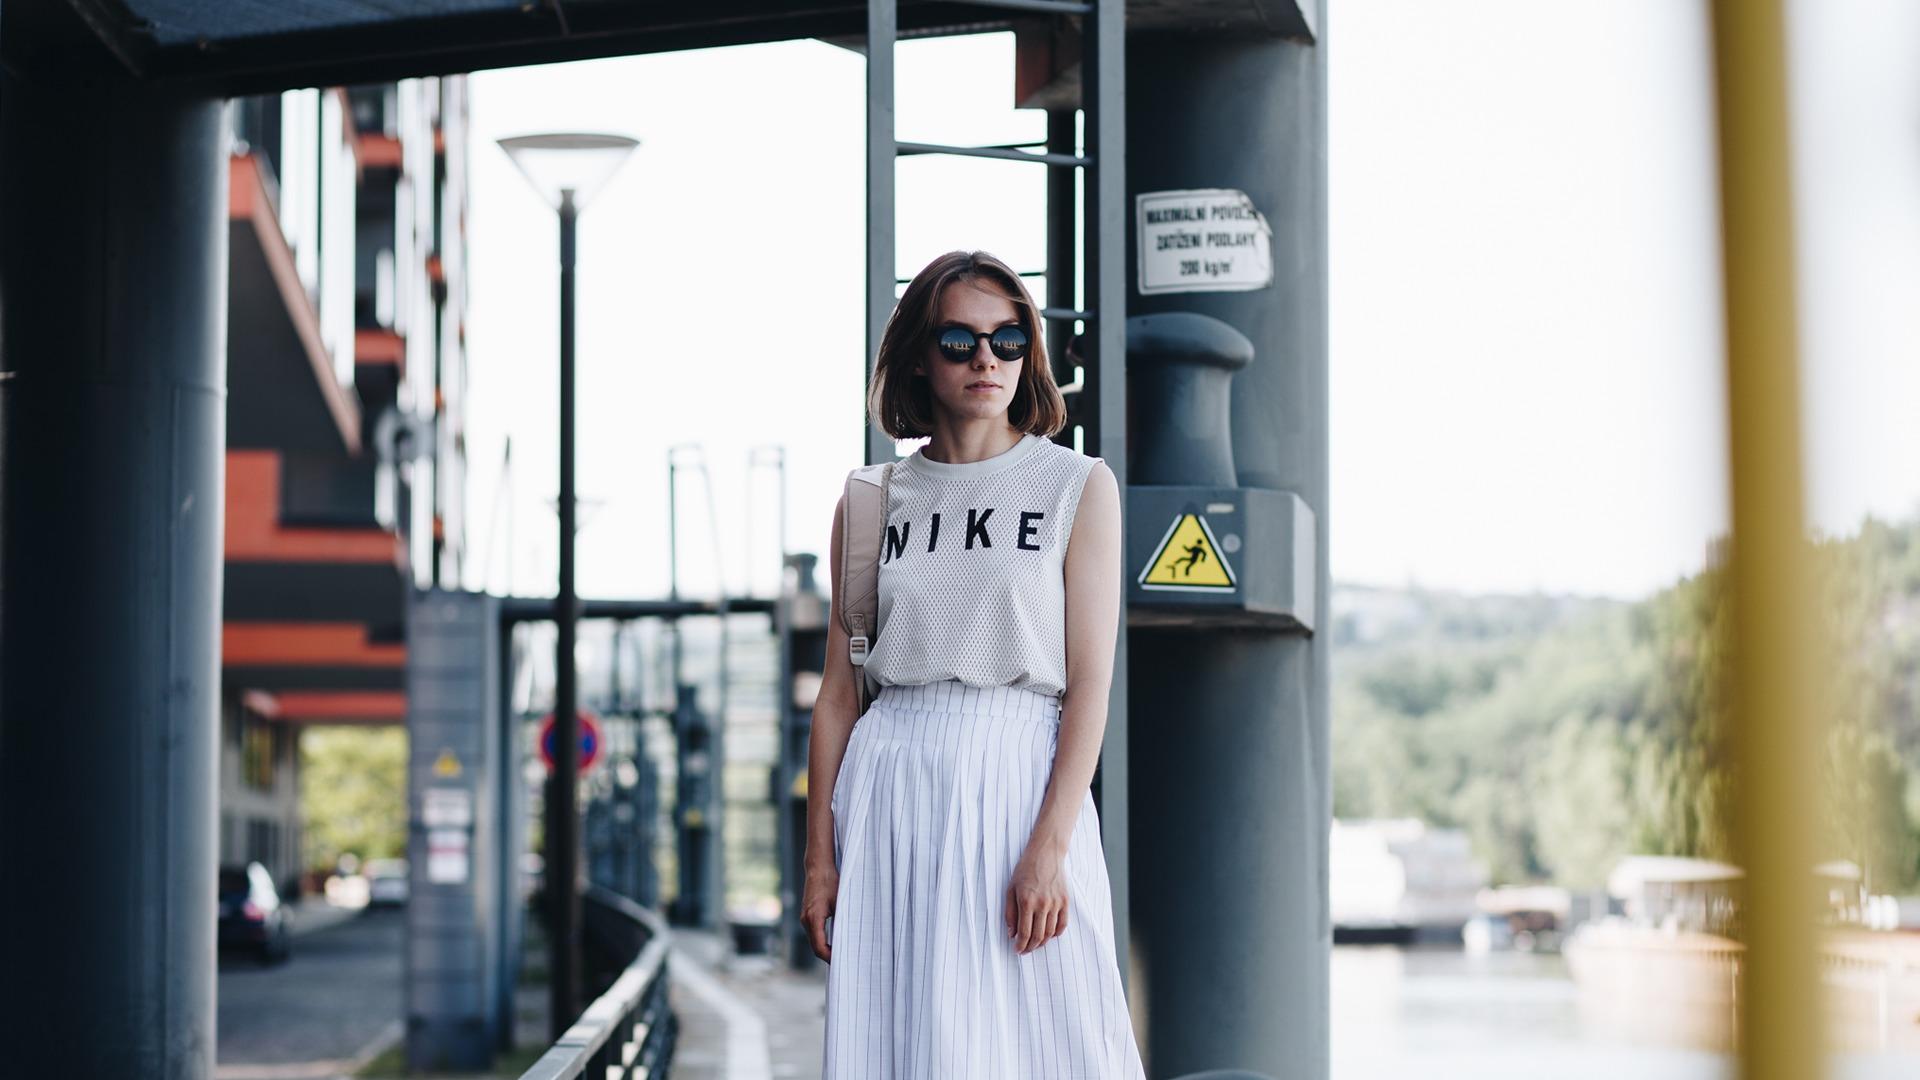 FTSHP fit w/ Elena Smirnova @Ellenasm